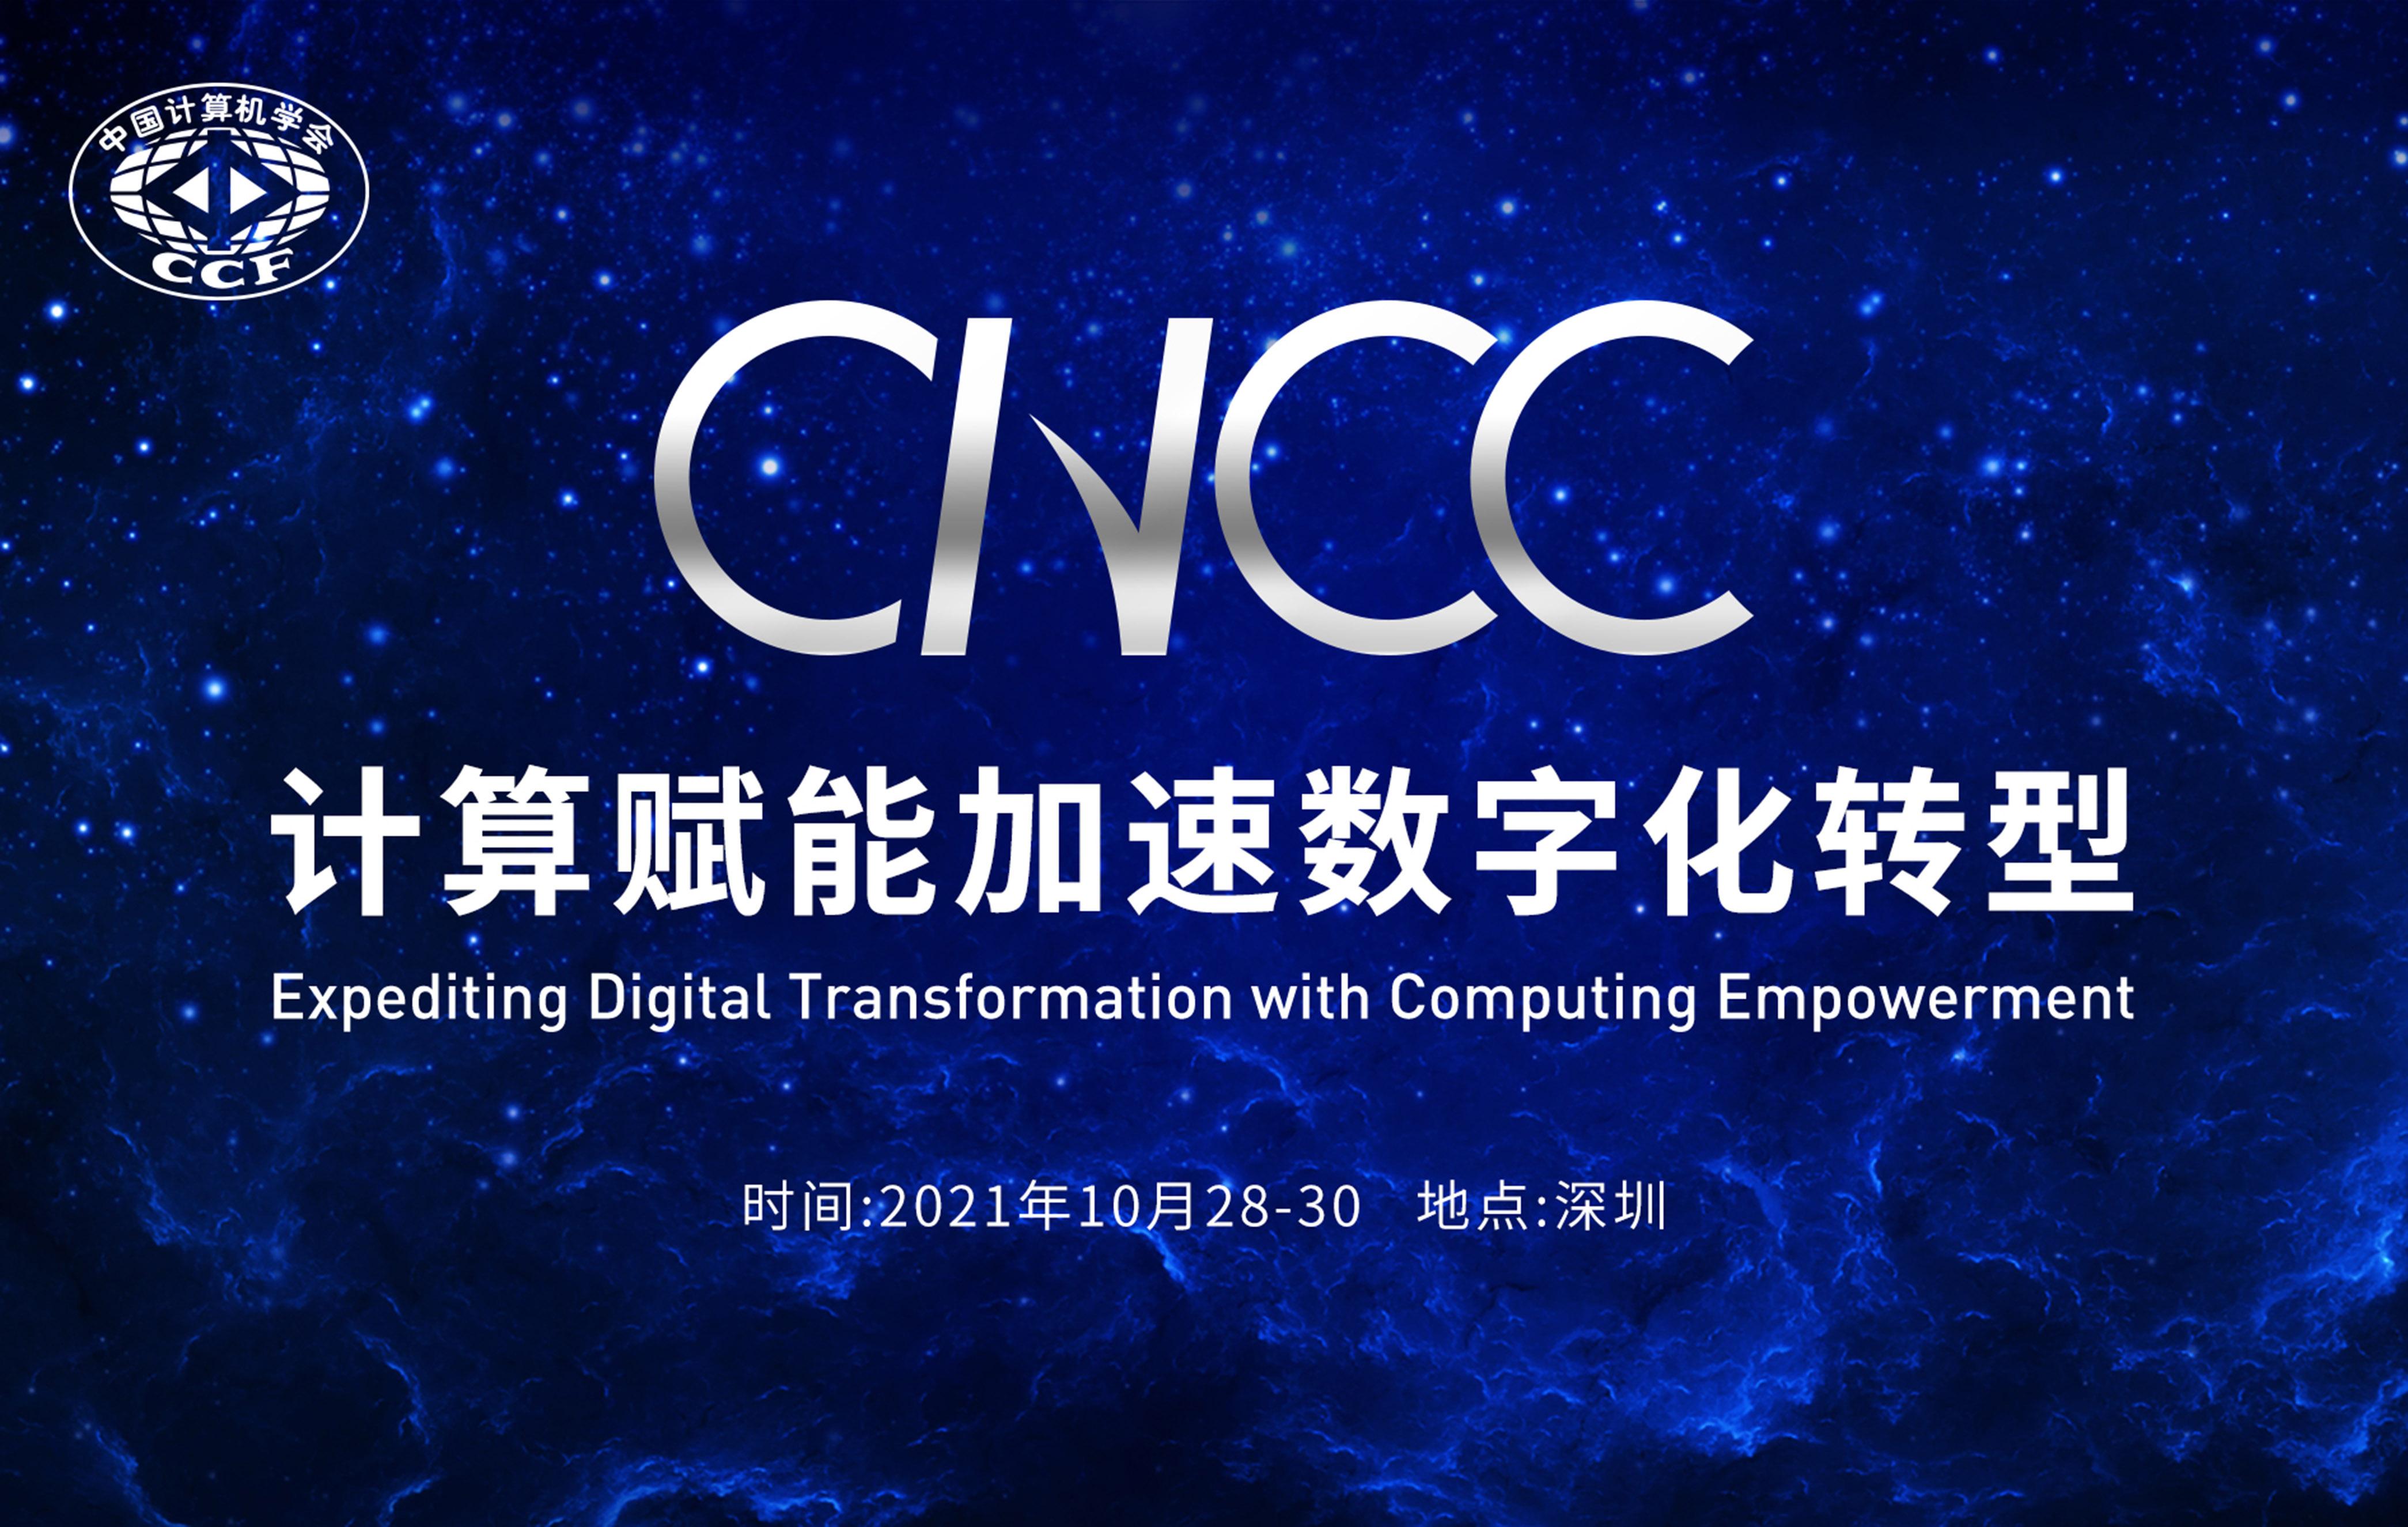 CNCC2021